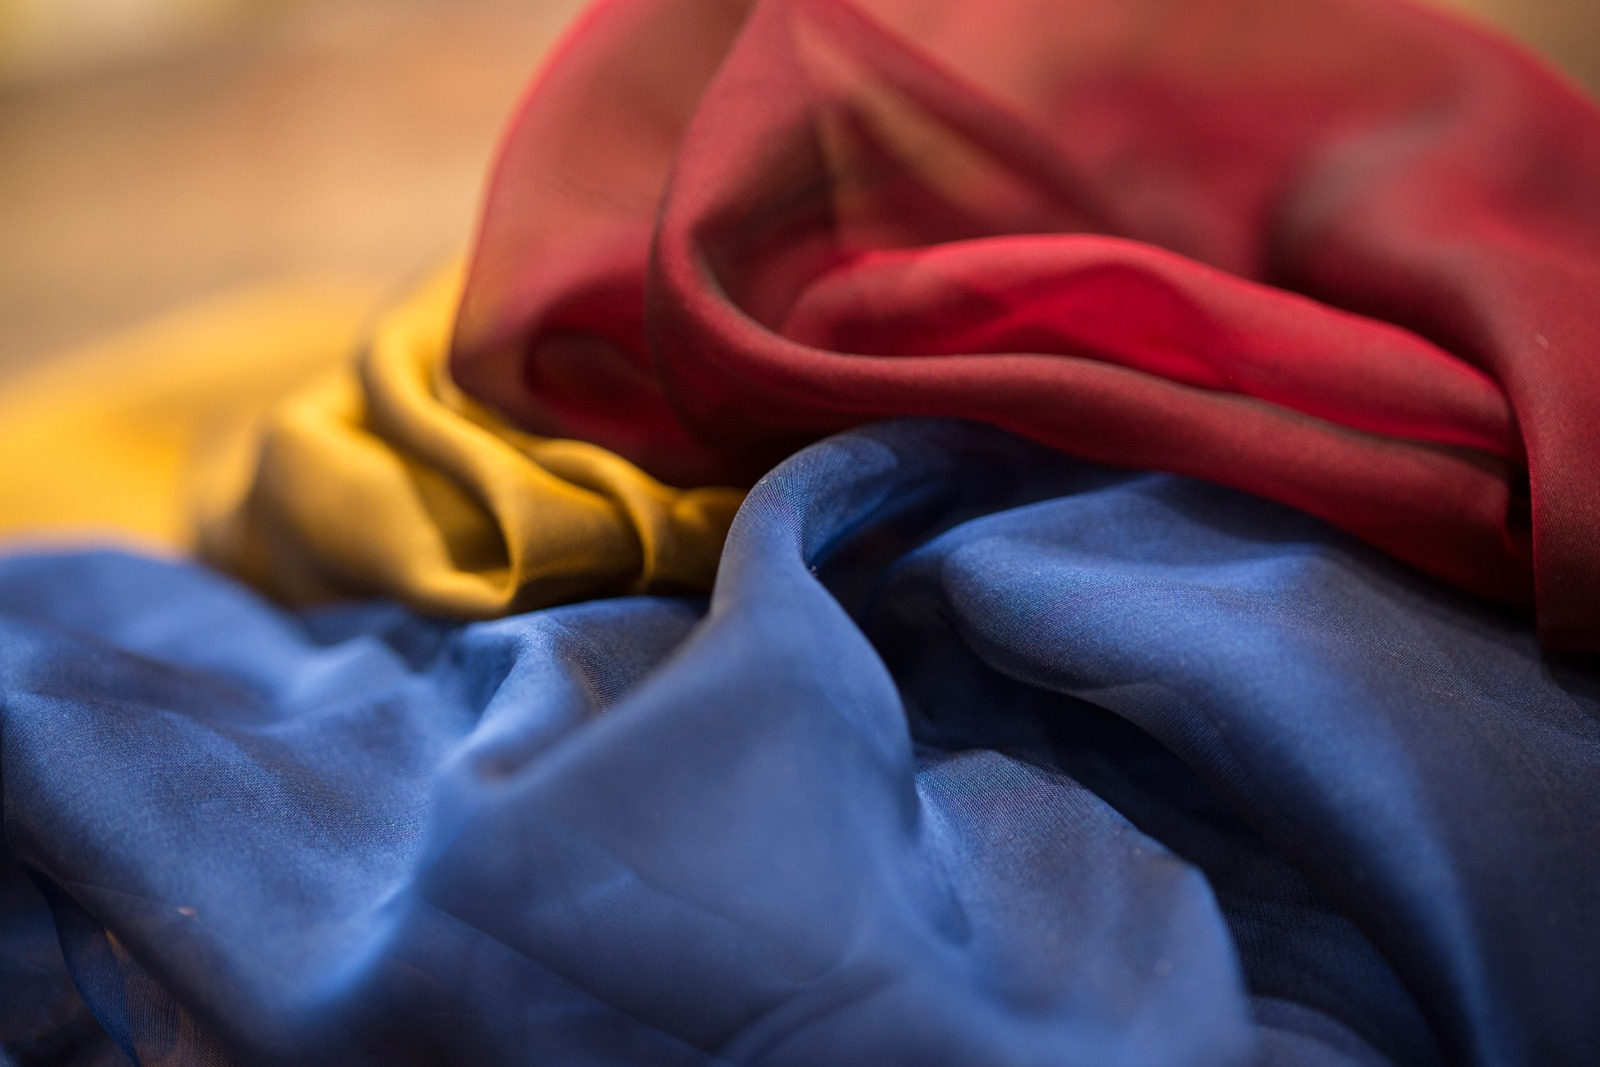 Shop new tess - ecommerce vendita online tessuti abbigliamento, sartoria e moda al metro